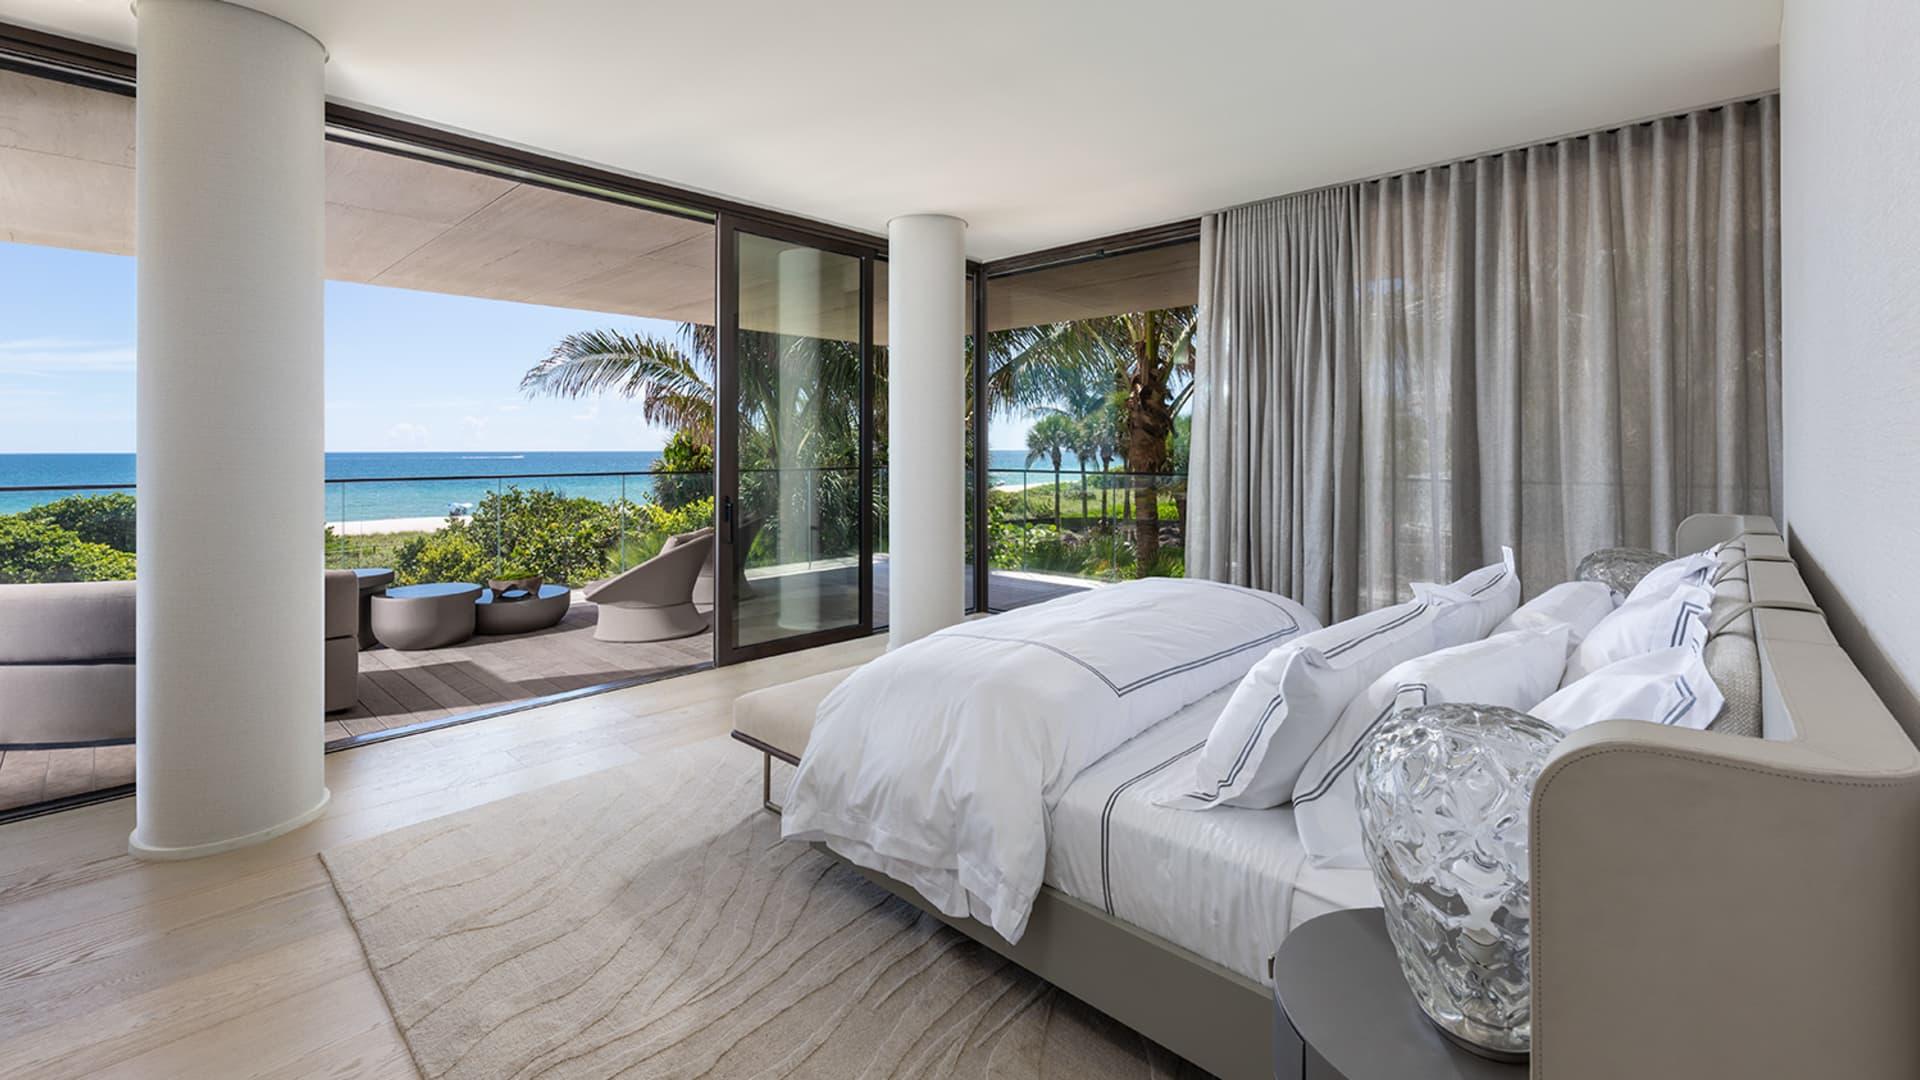 The Arte condominium in the Surfside neighborhood of Miami Beach features 16 luxury units.